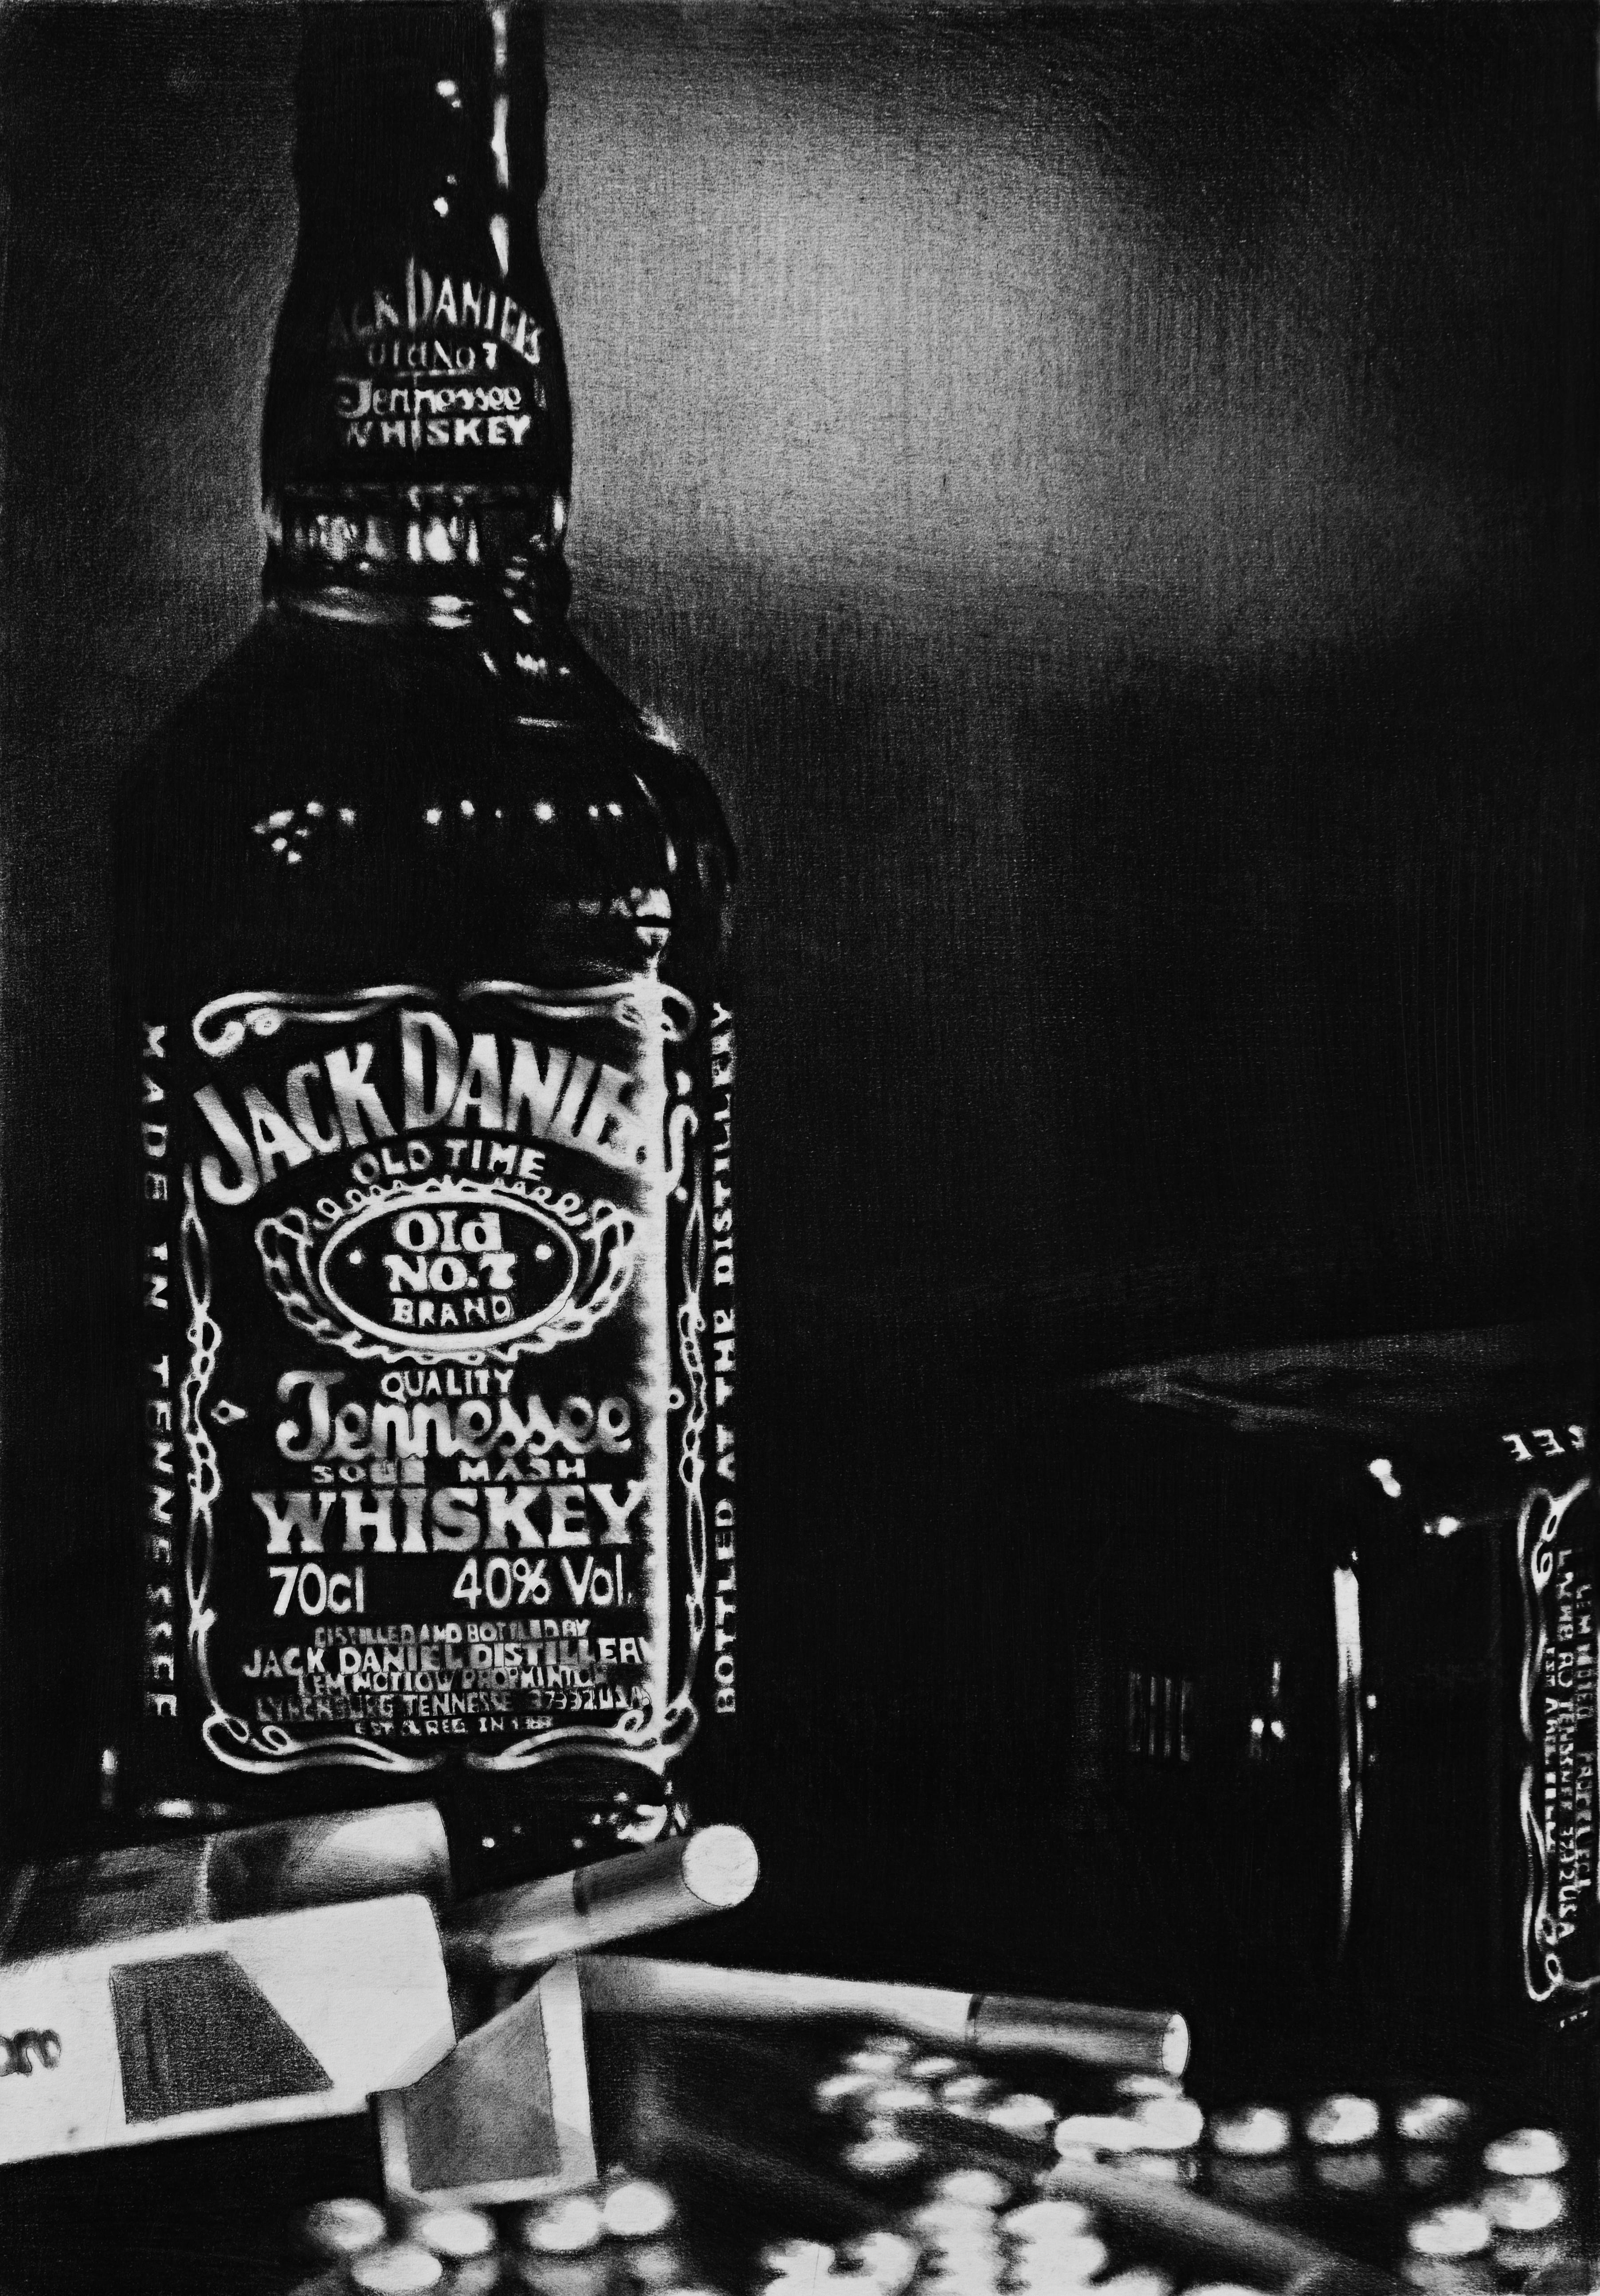 jack daniels bottle tumblr - photo #36